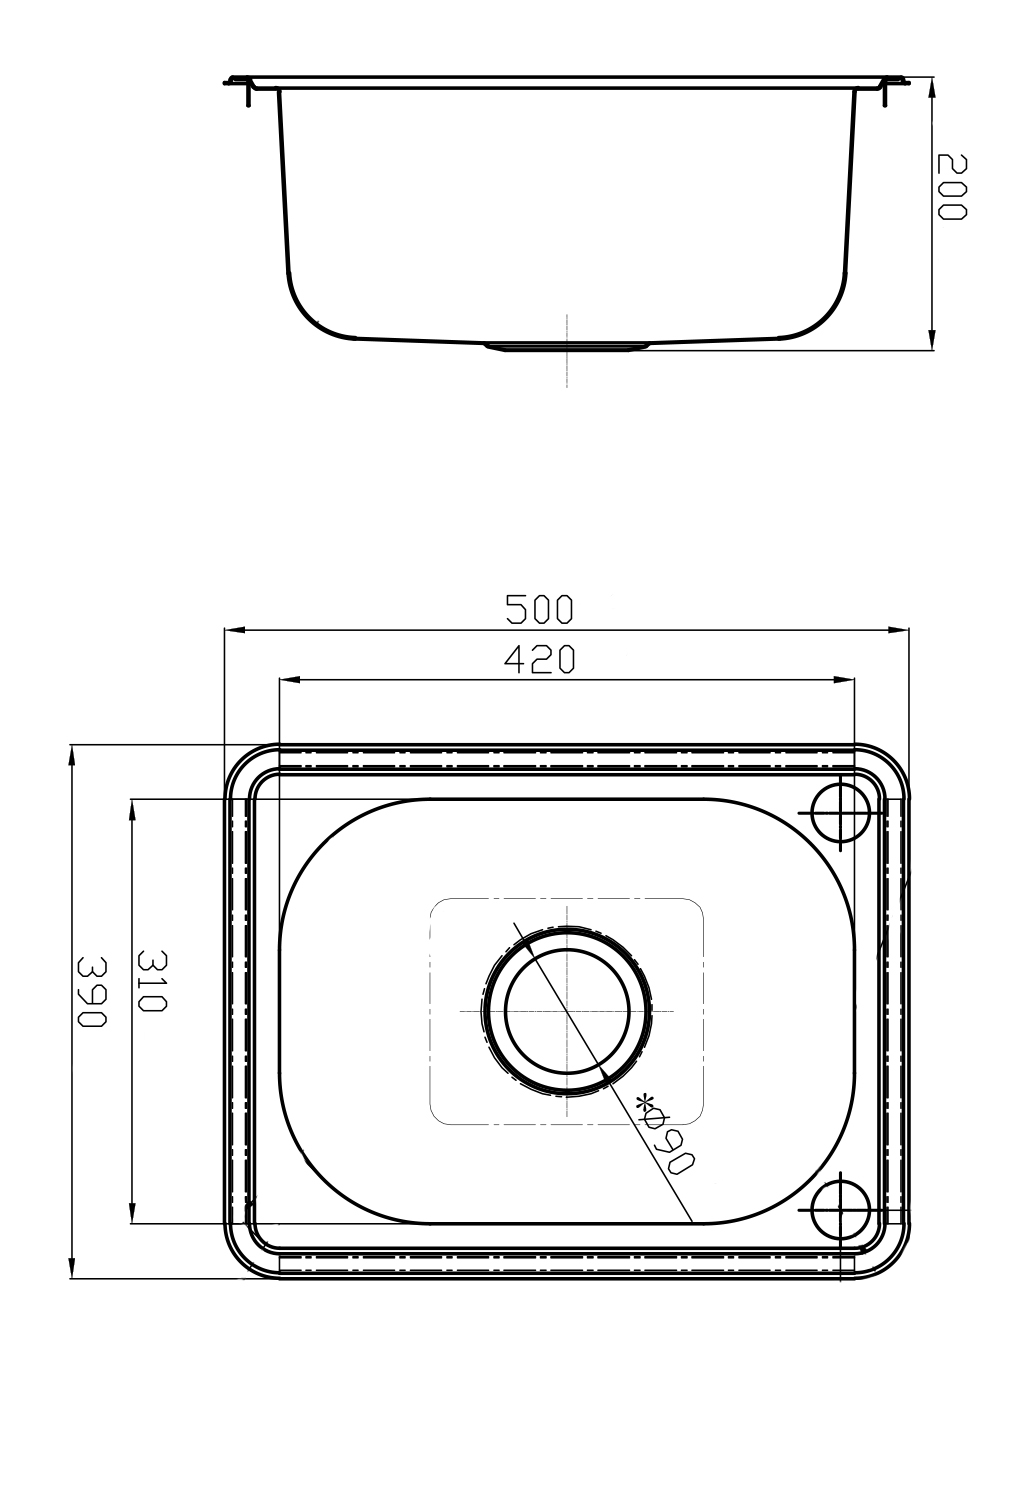 Line Art Ks : Format litre laundry tub sinks argent